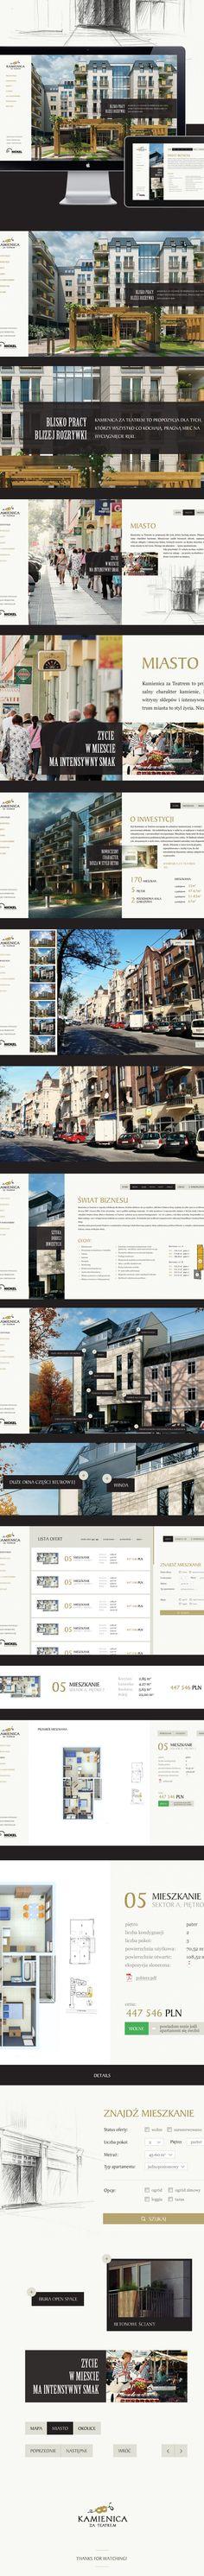 Kamienica za Teatrem - WEB